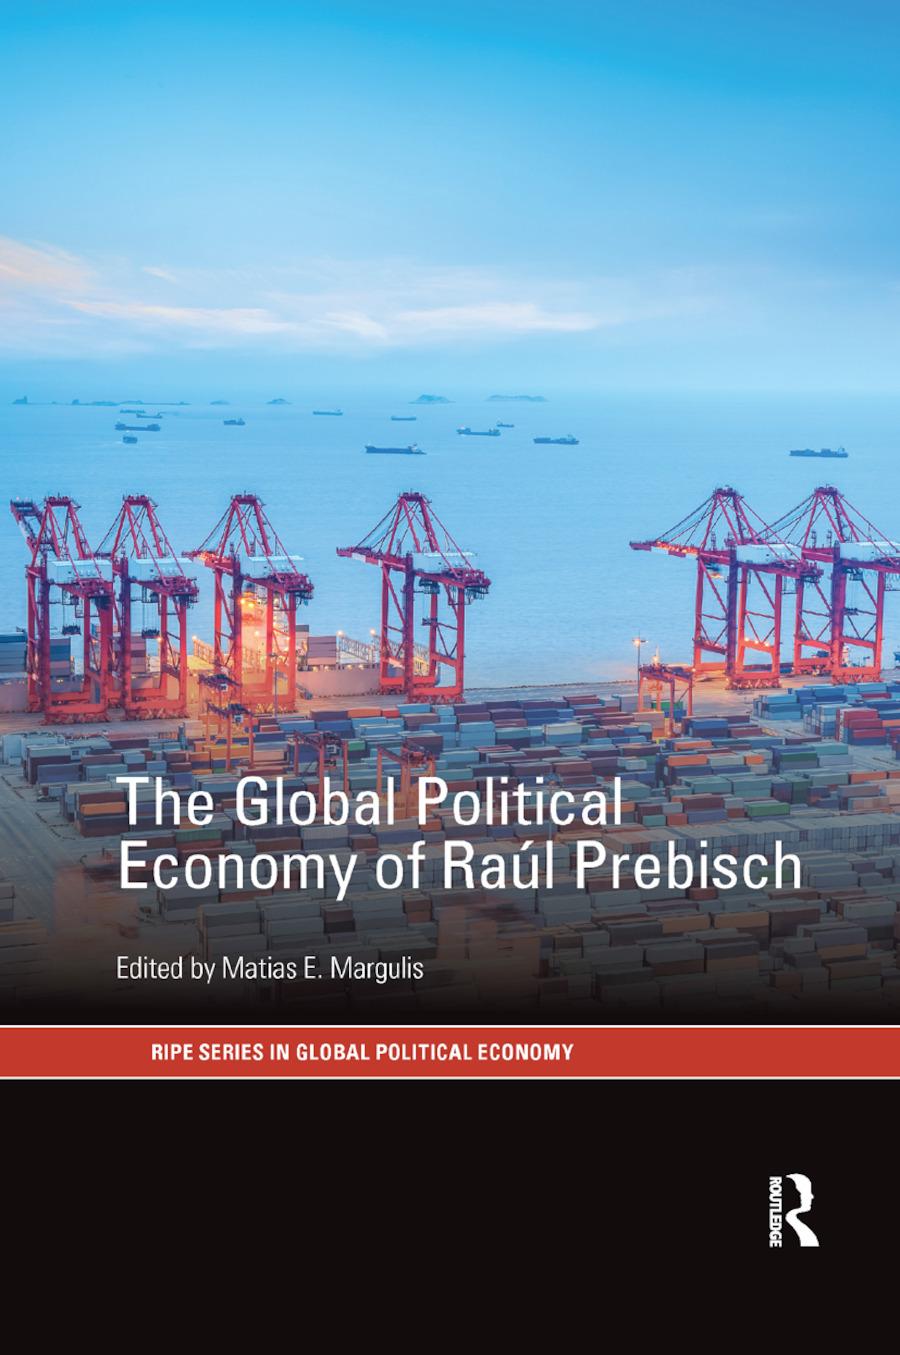 The Global Political Economy of Ra�l Prebisch book cover